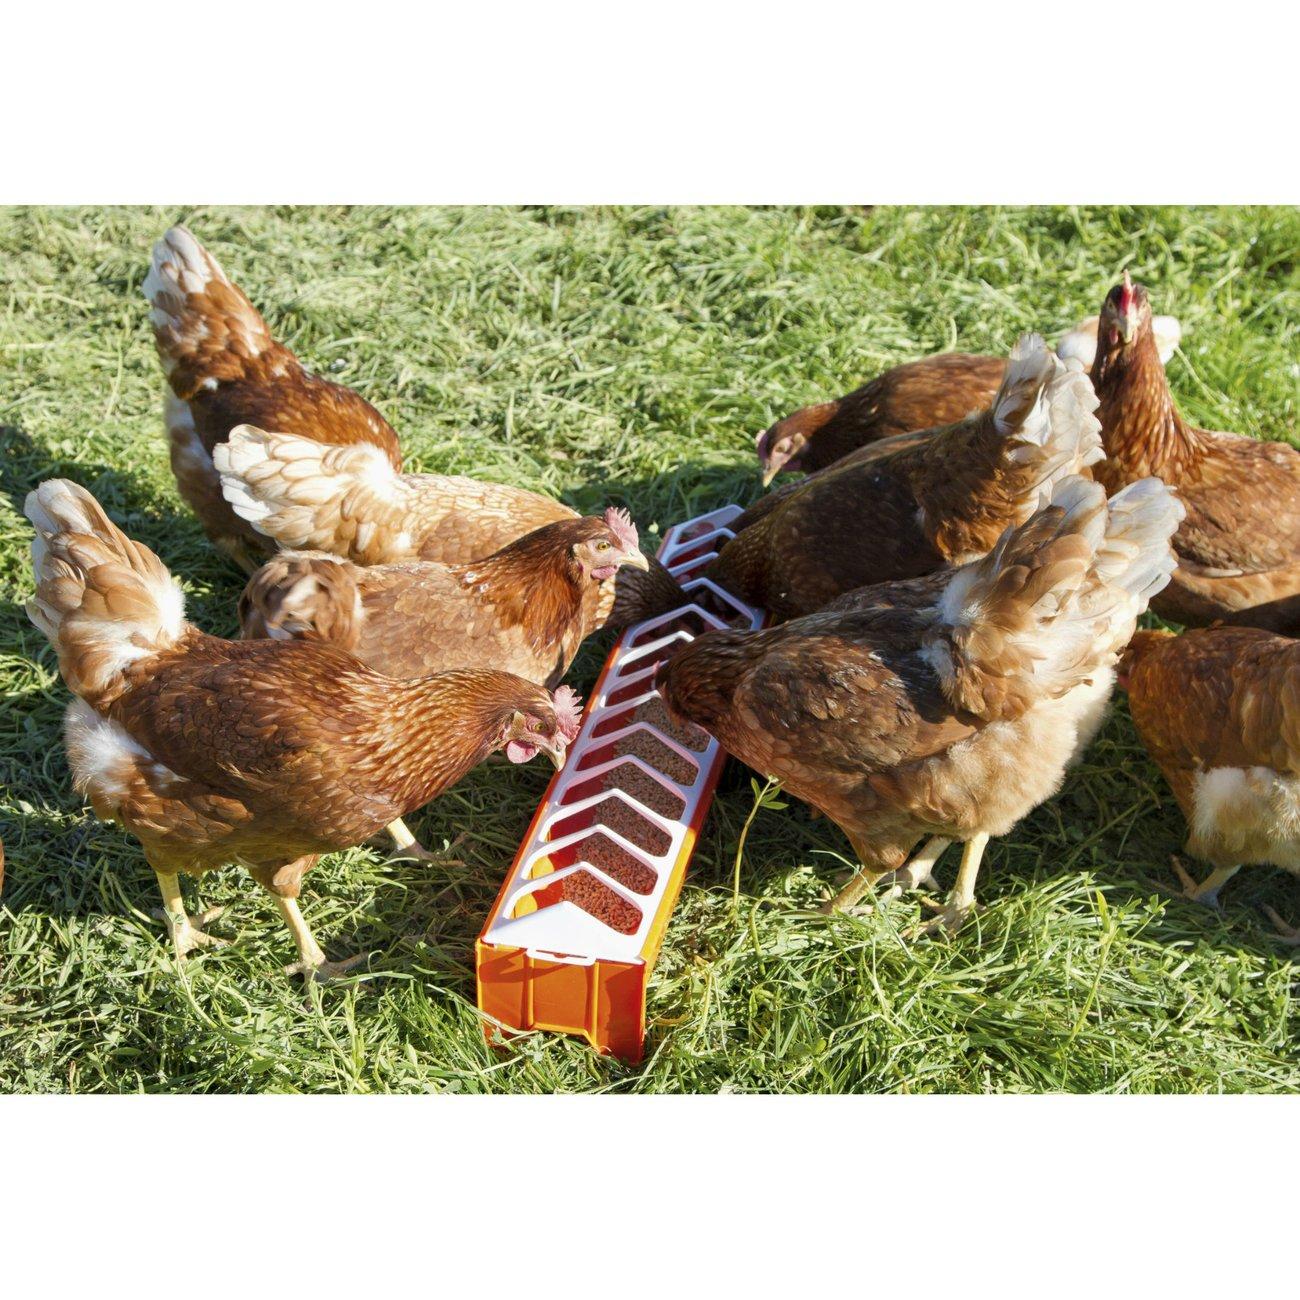 Hühner Futtertrog aus Kunststoff Bild 4